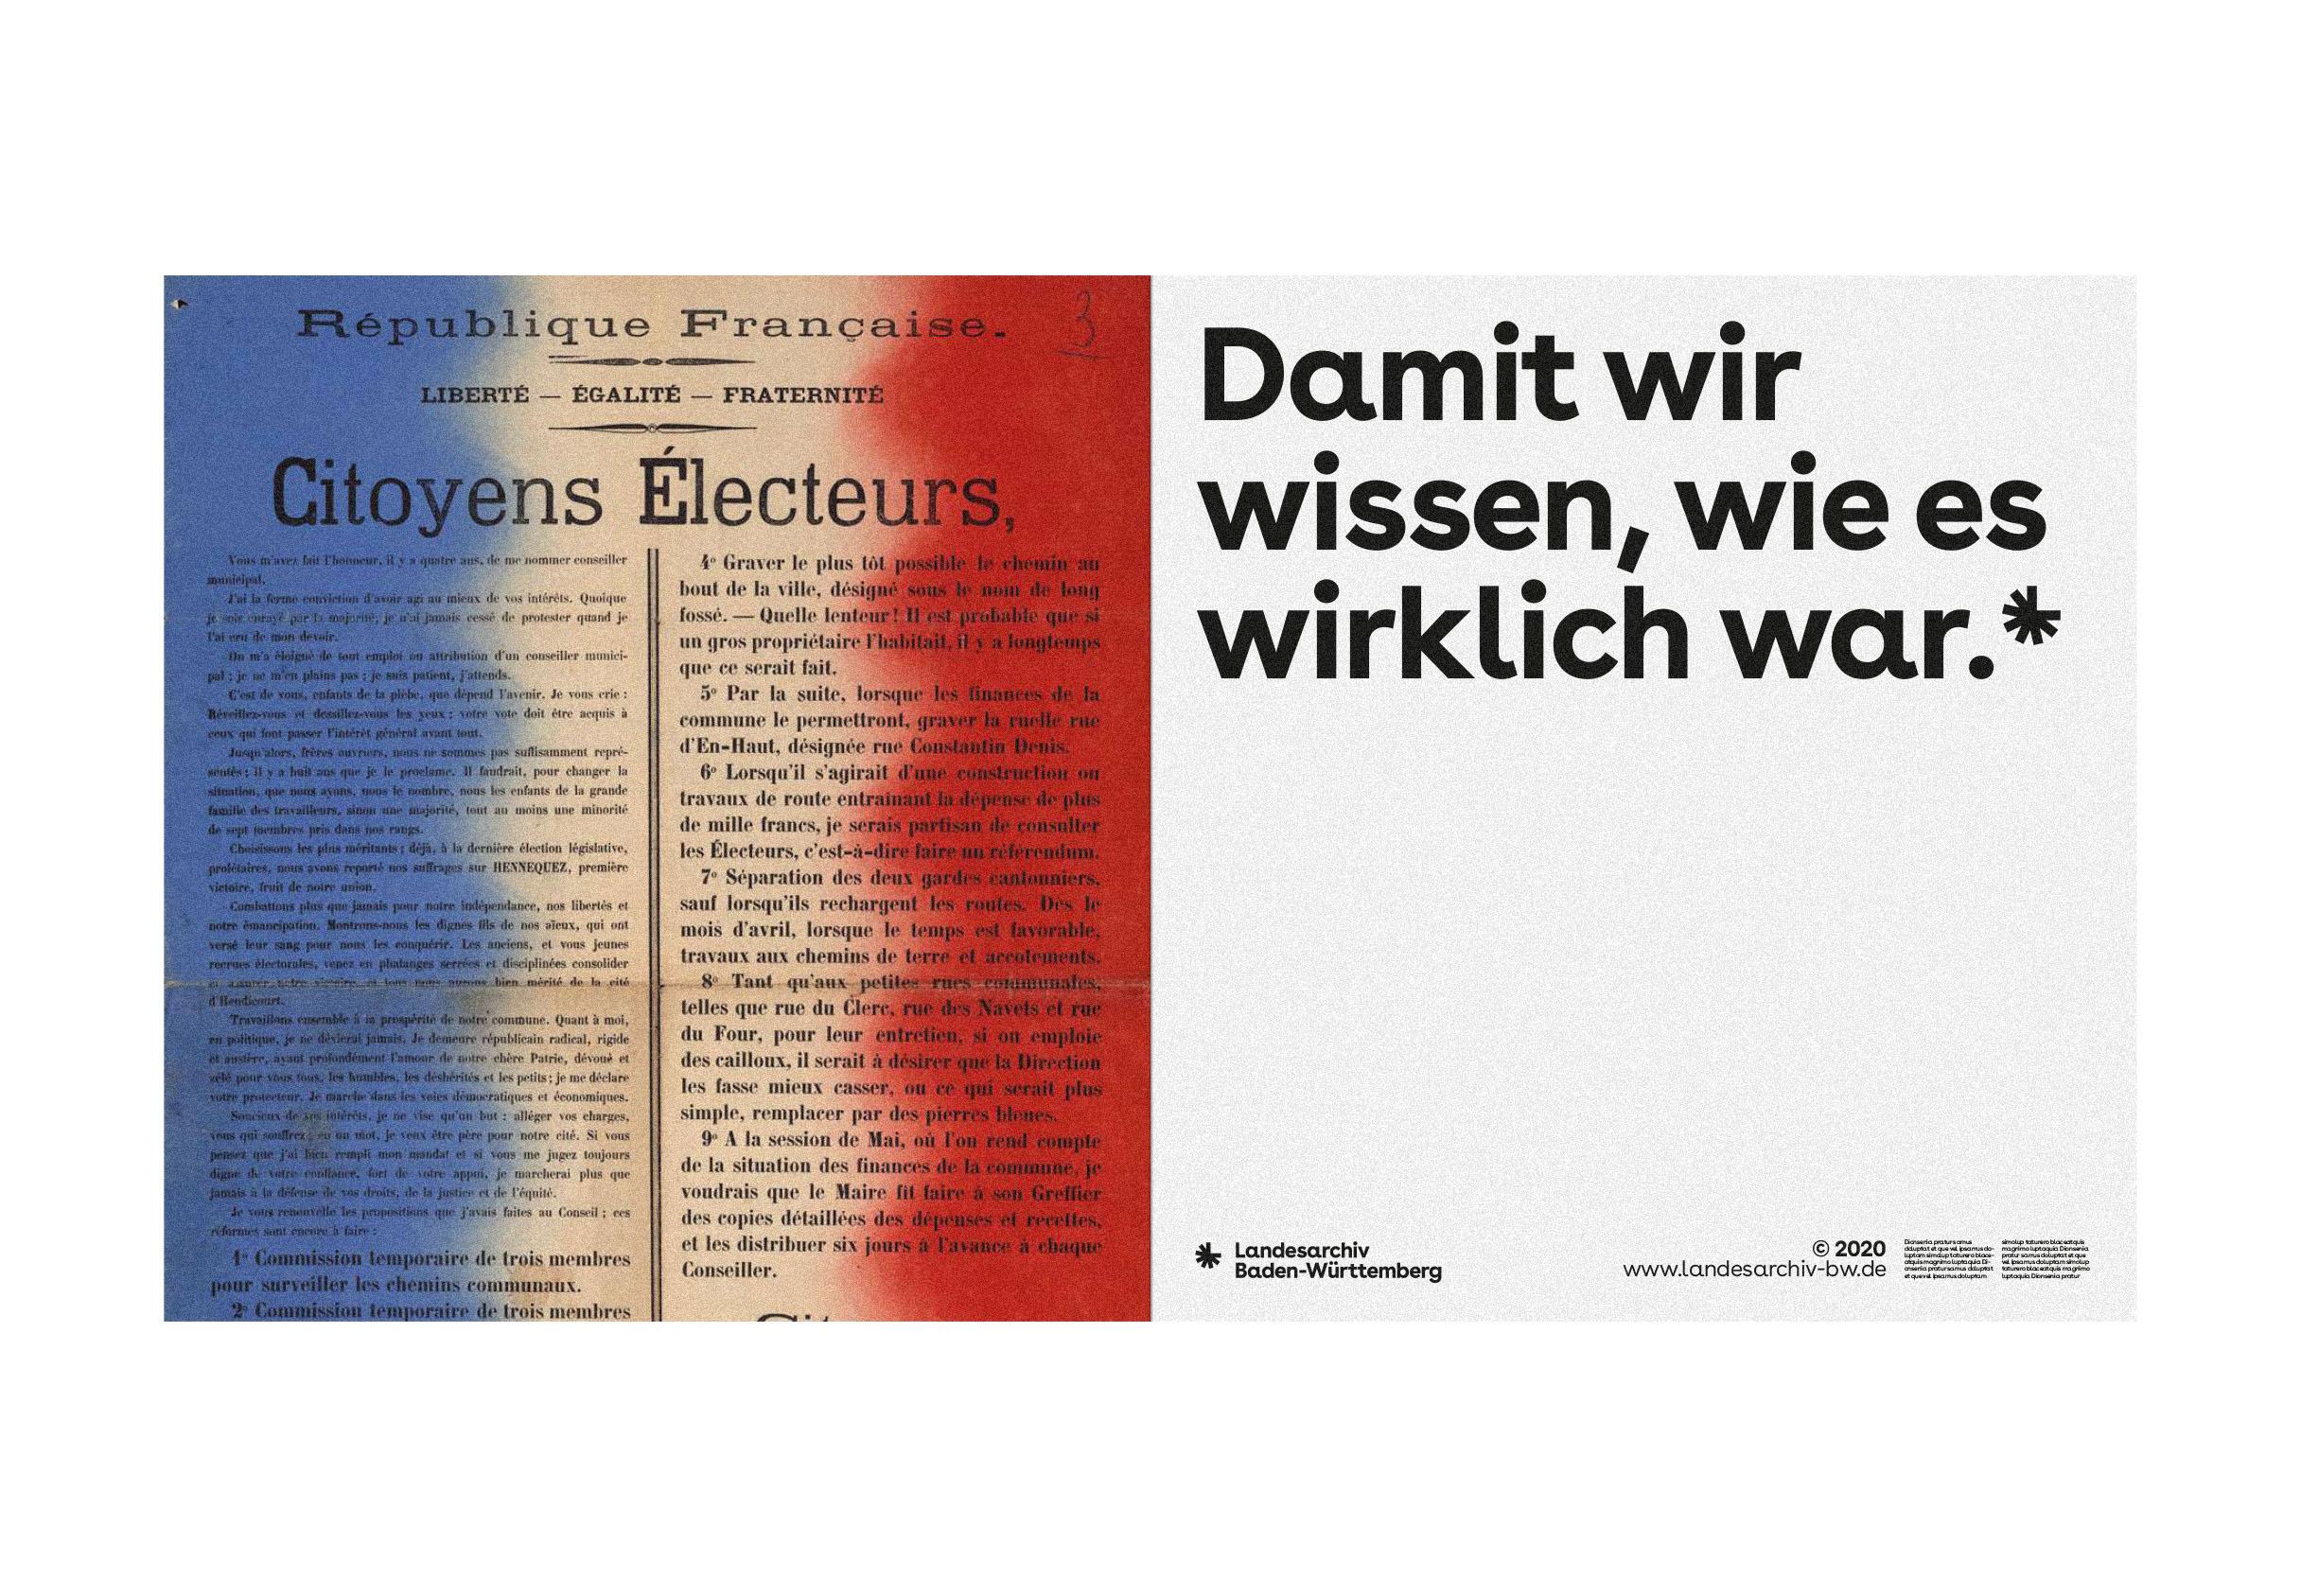 Bureau Johannes Erler – Landesarchiv Baden-Württemberg